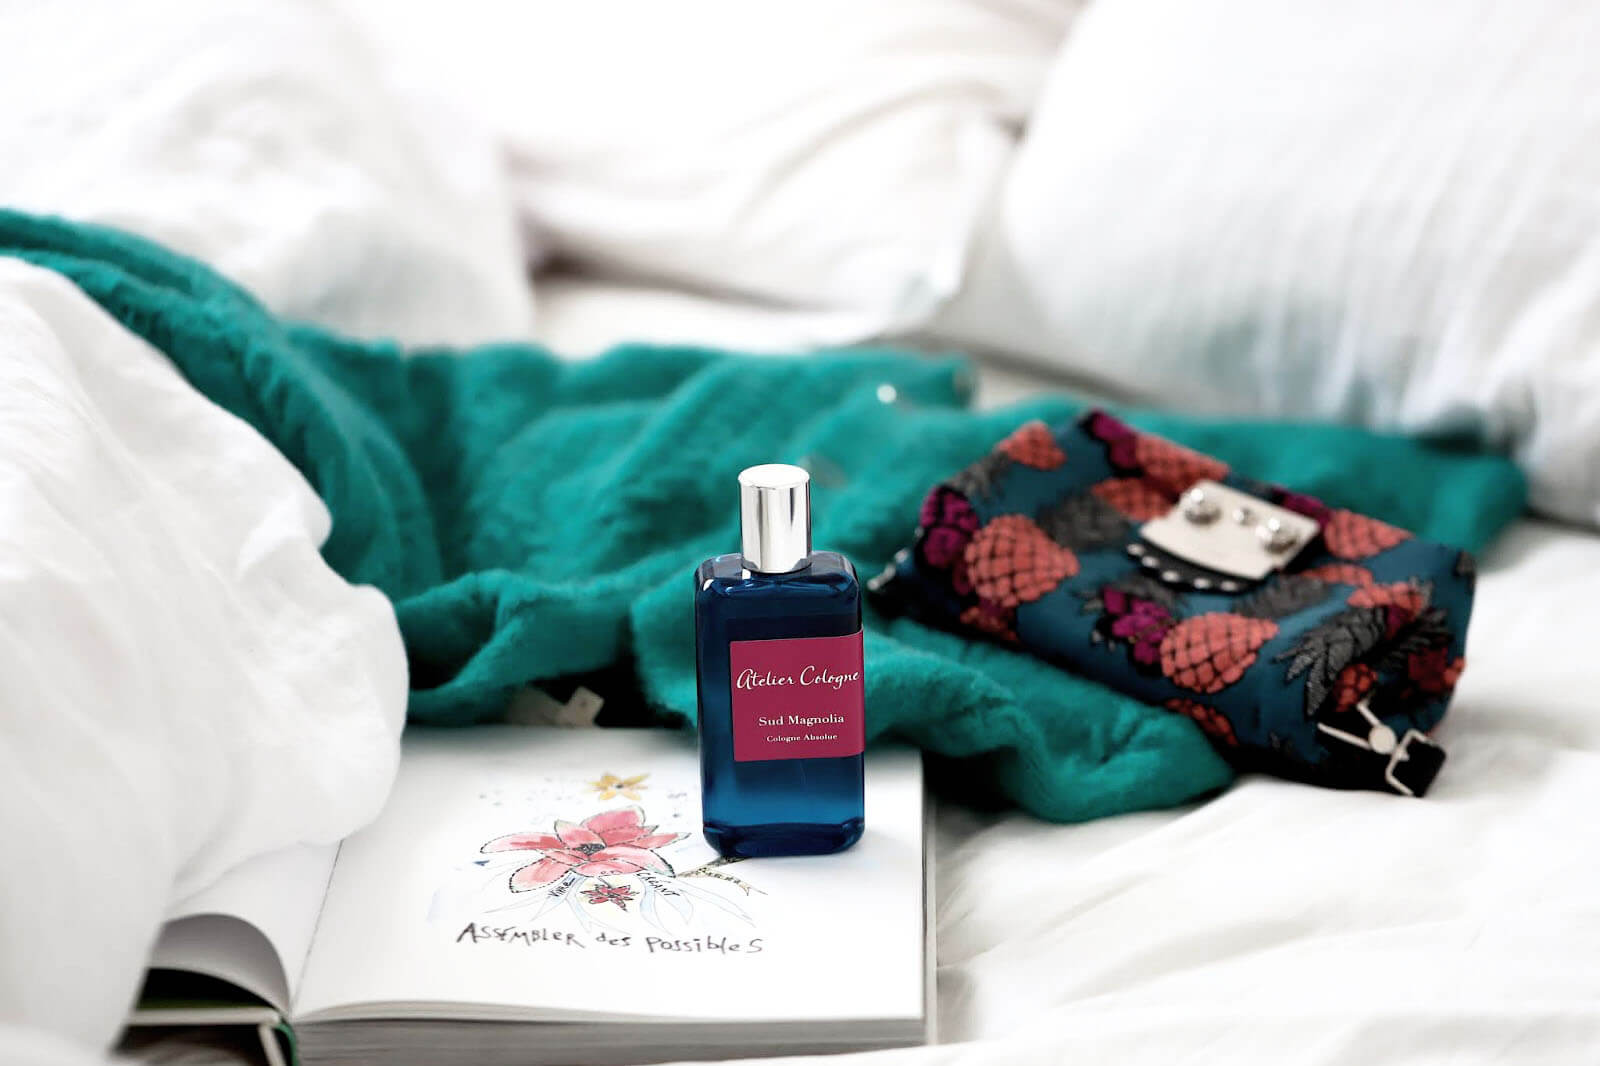 Atelier Cologne Sud Magnolia parfum